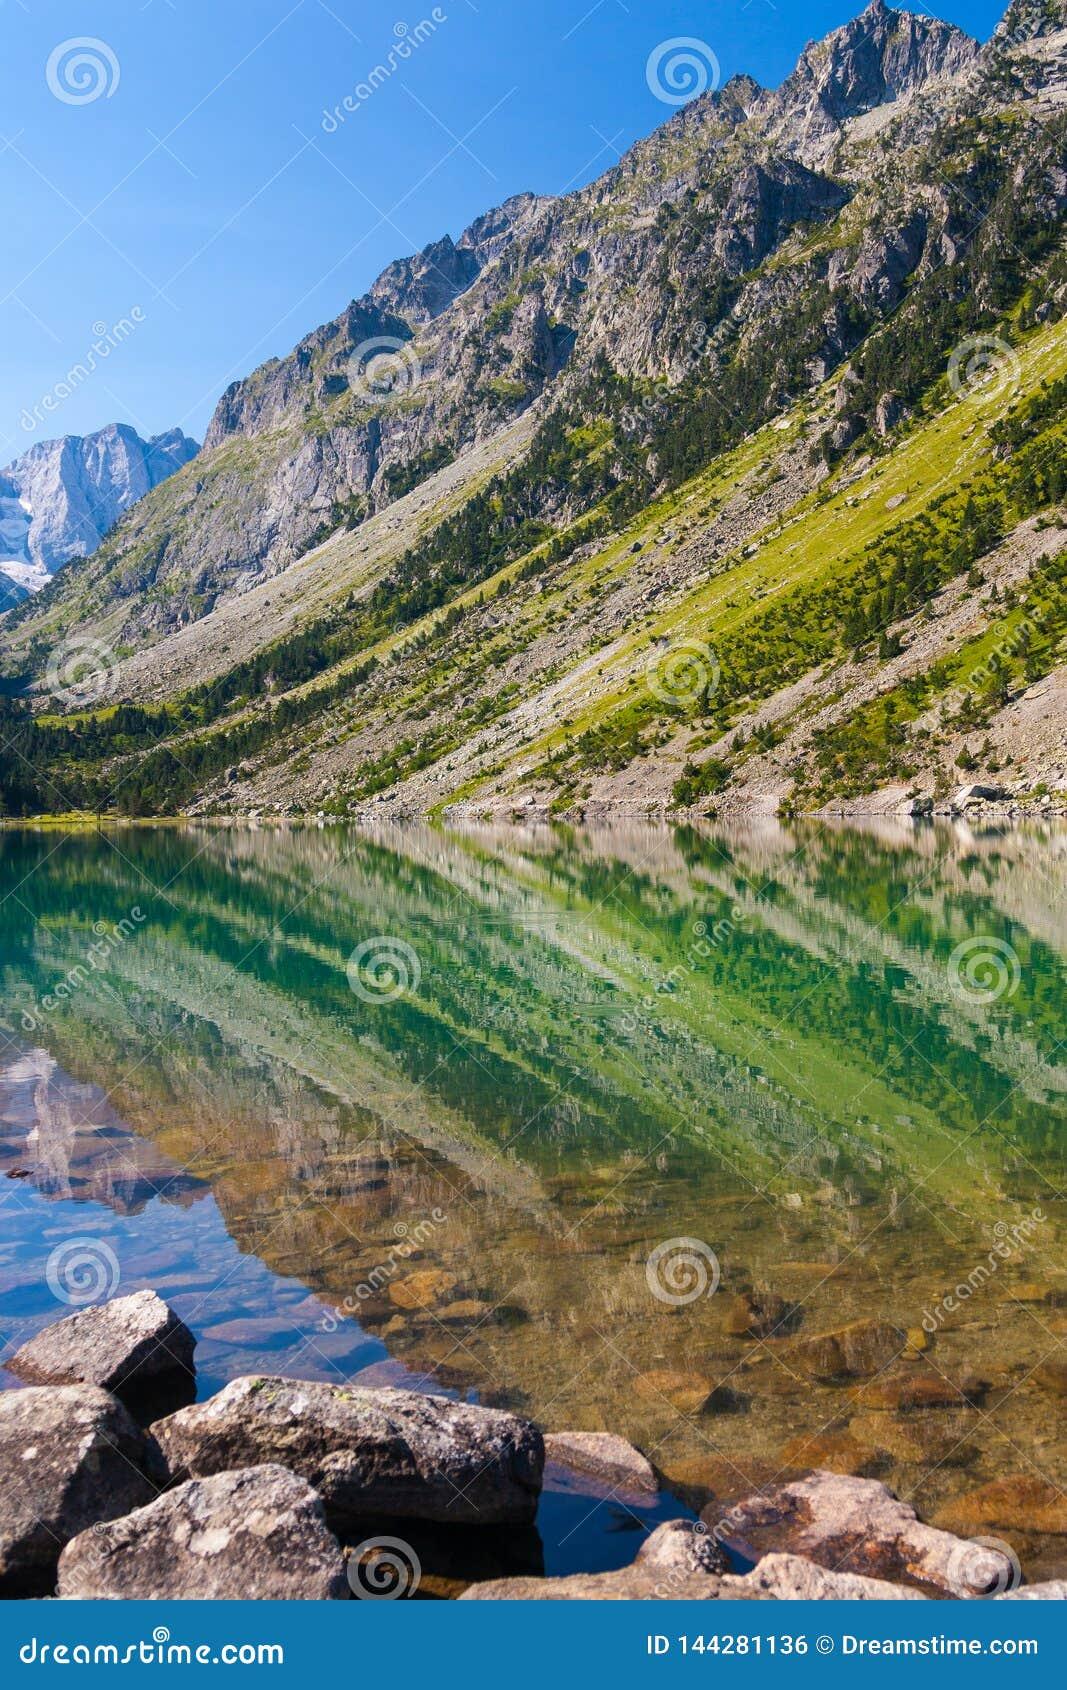 Gaube lake in Pyrenees mountain range